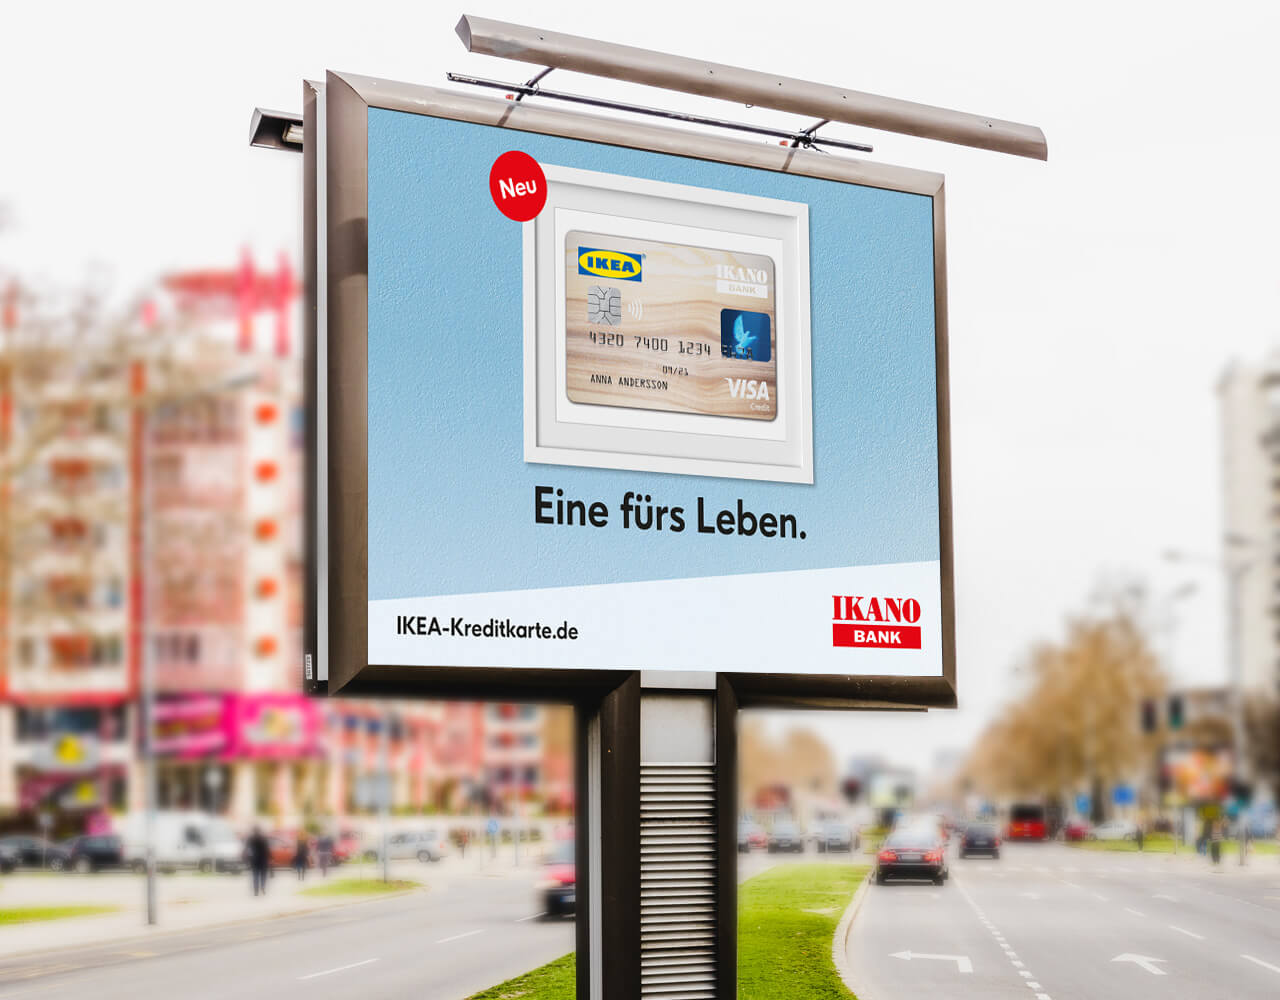 IKEA Kreditkarte Kampagne OOH Plakat IKEA Kreditkarte Kampagne OOH Bus